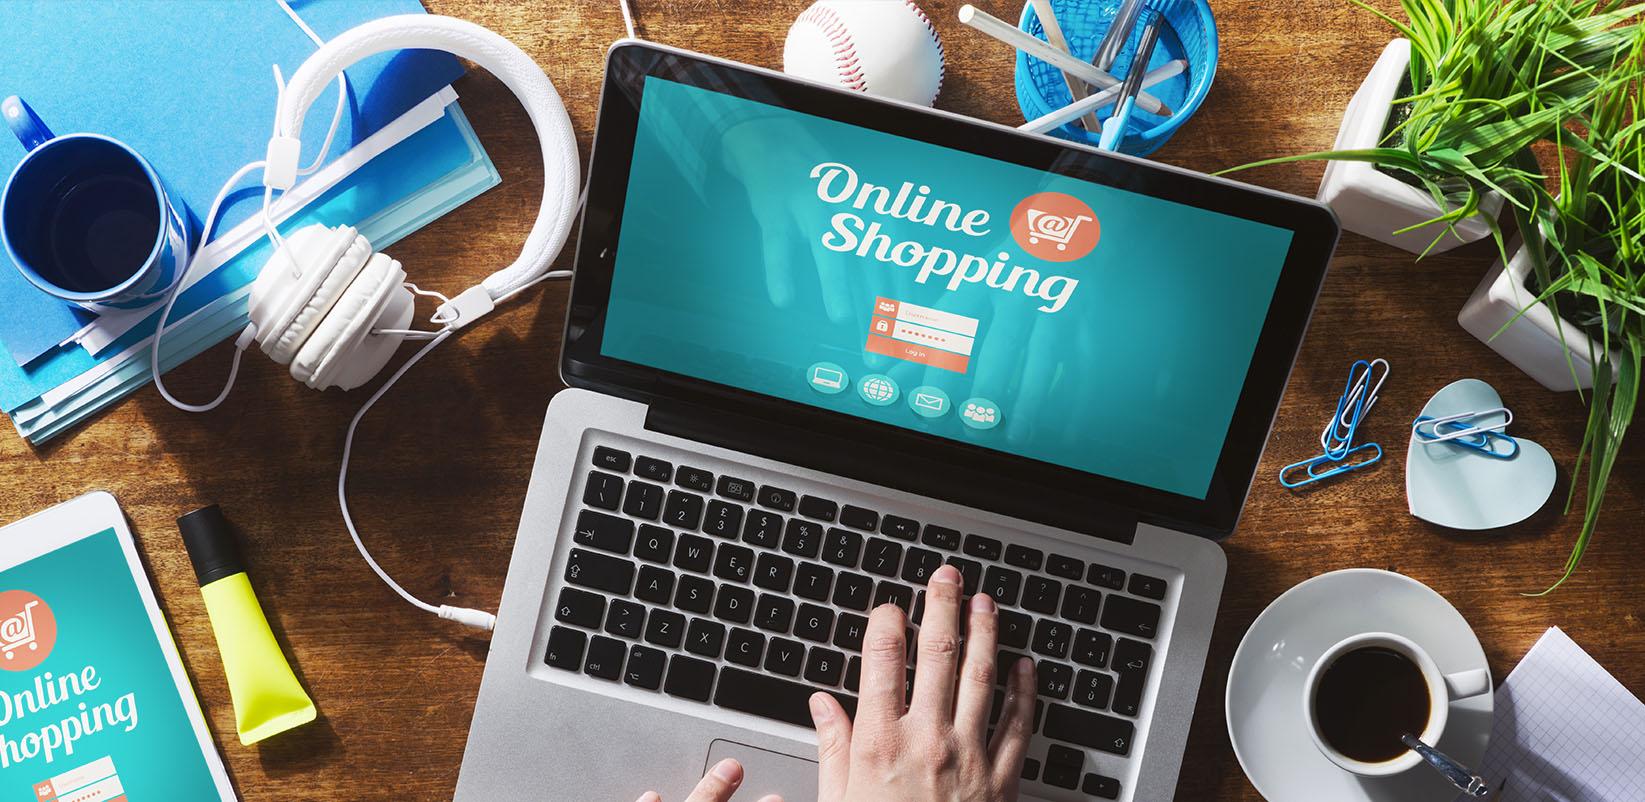 Tienda online / eCommerce / Página Web